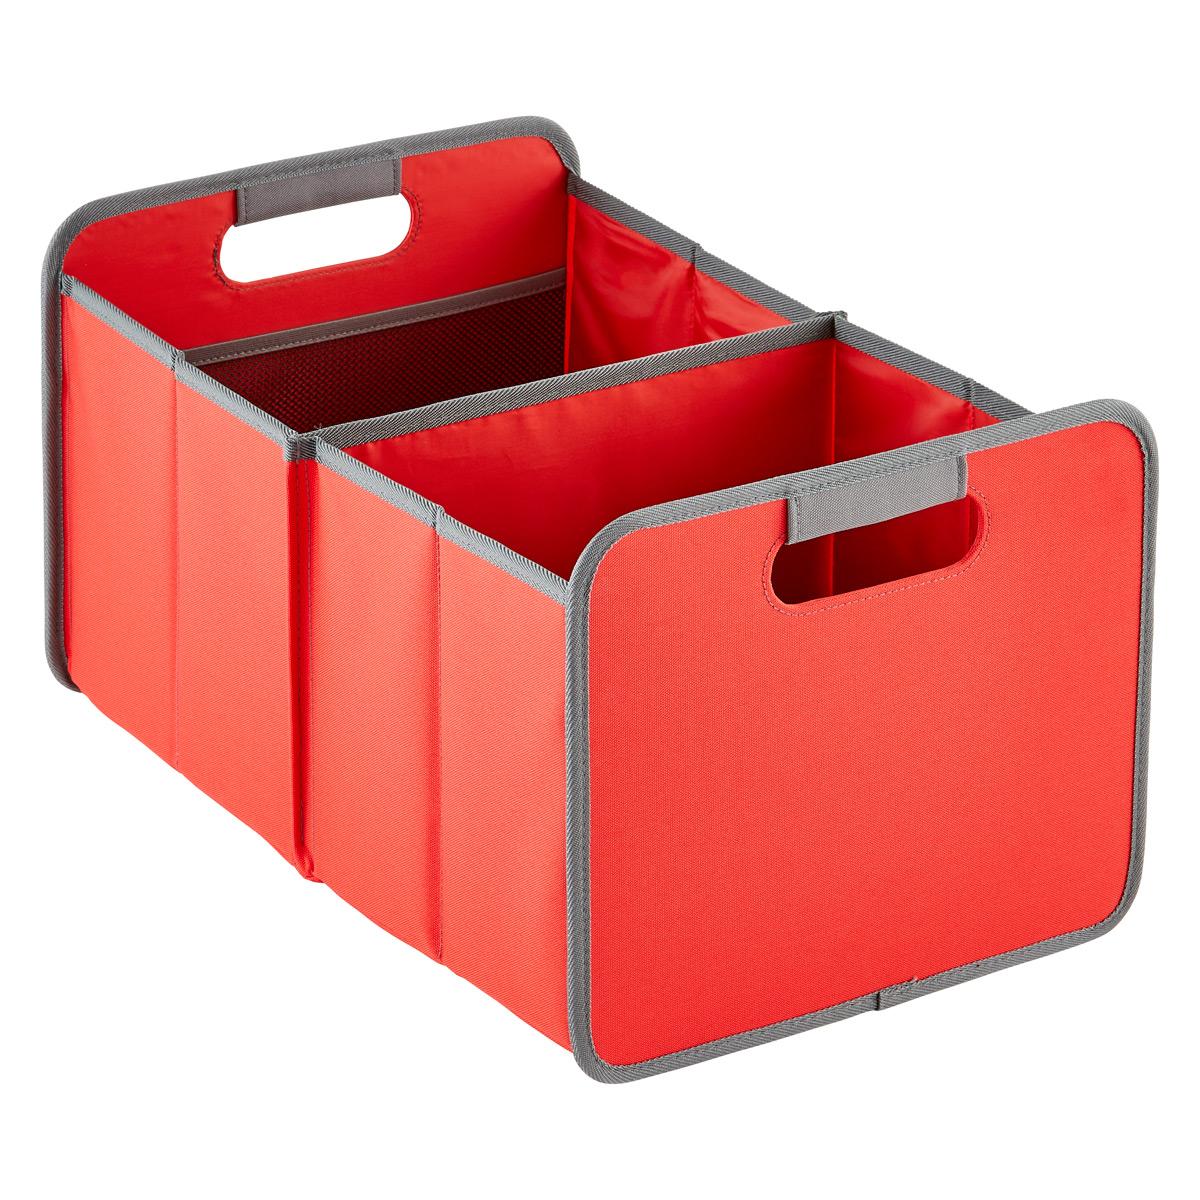 Meori~ Foldable Box